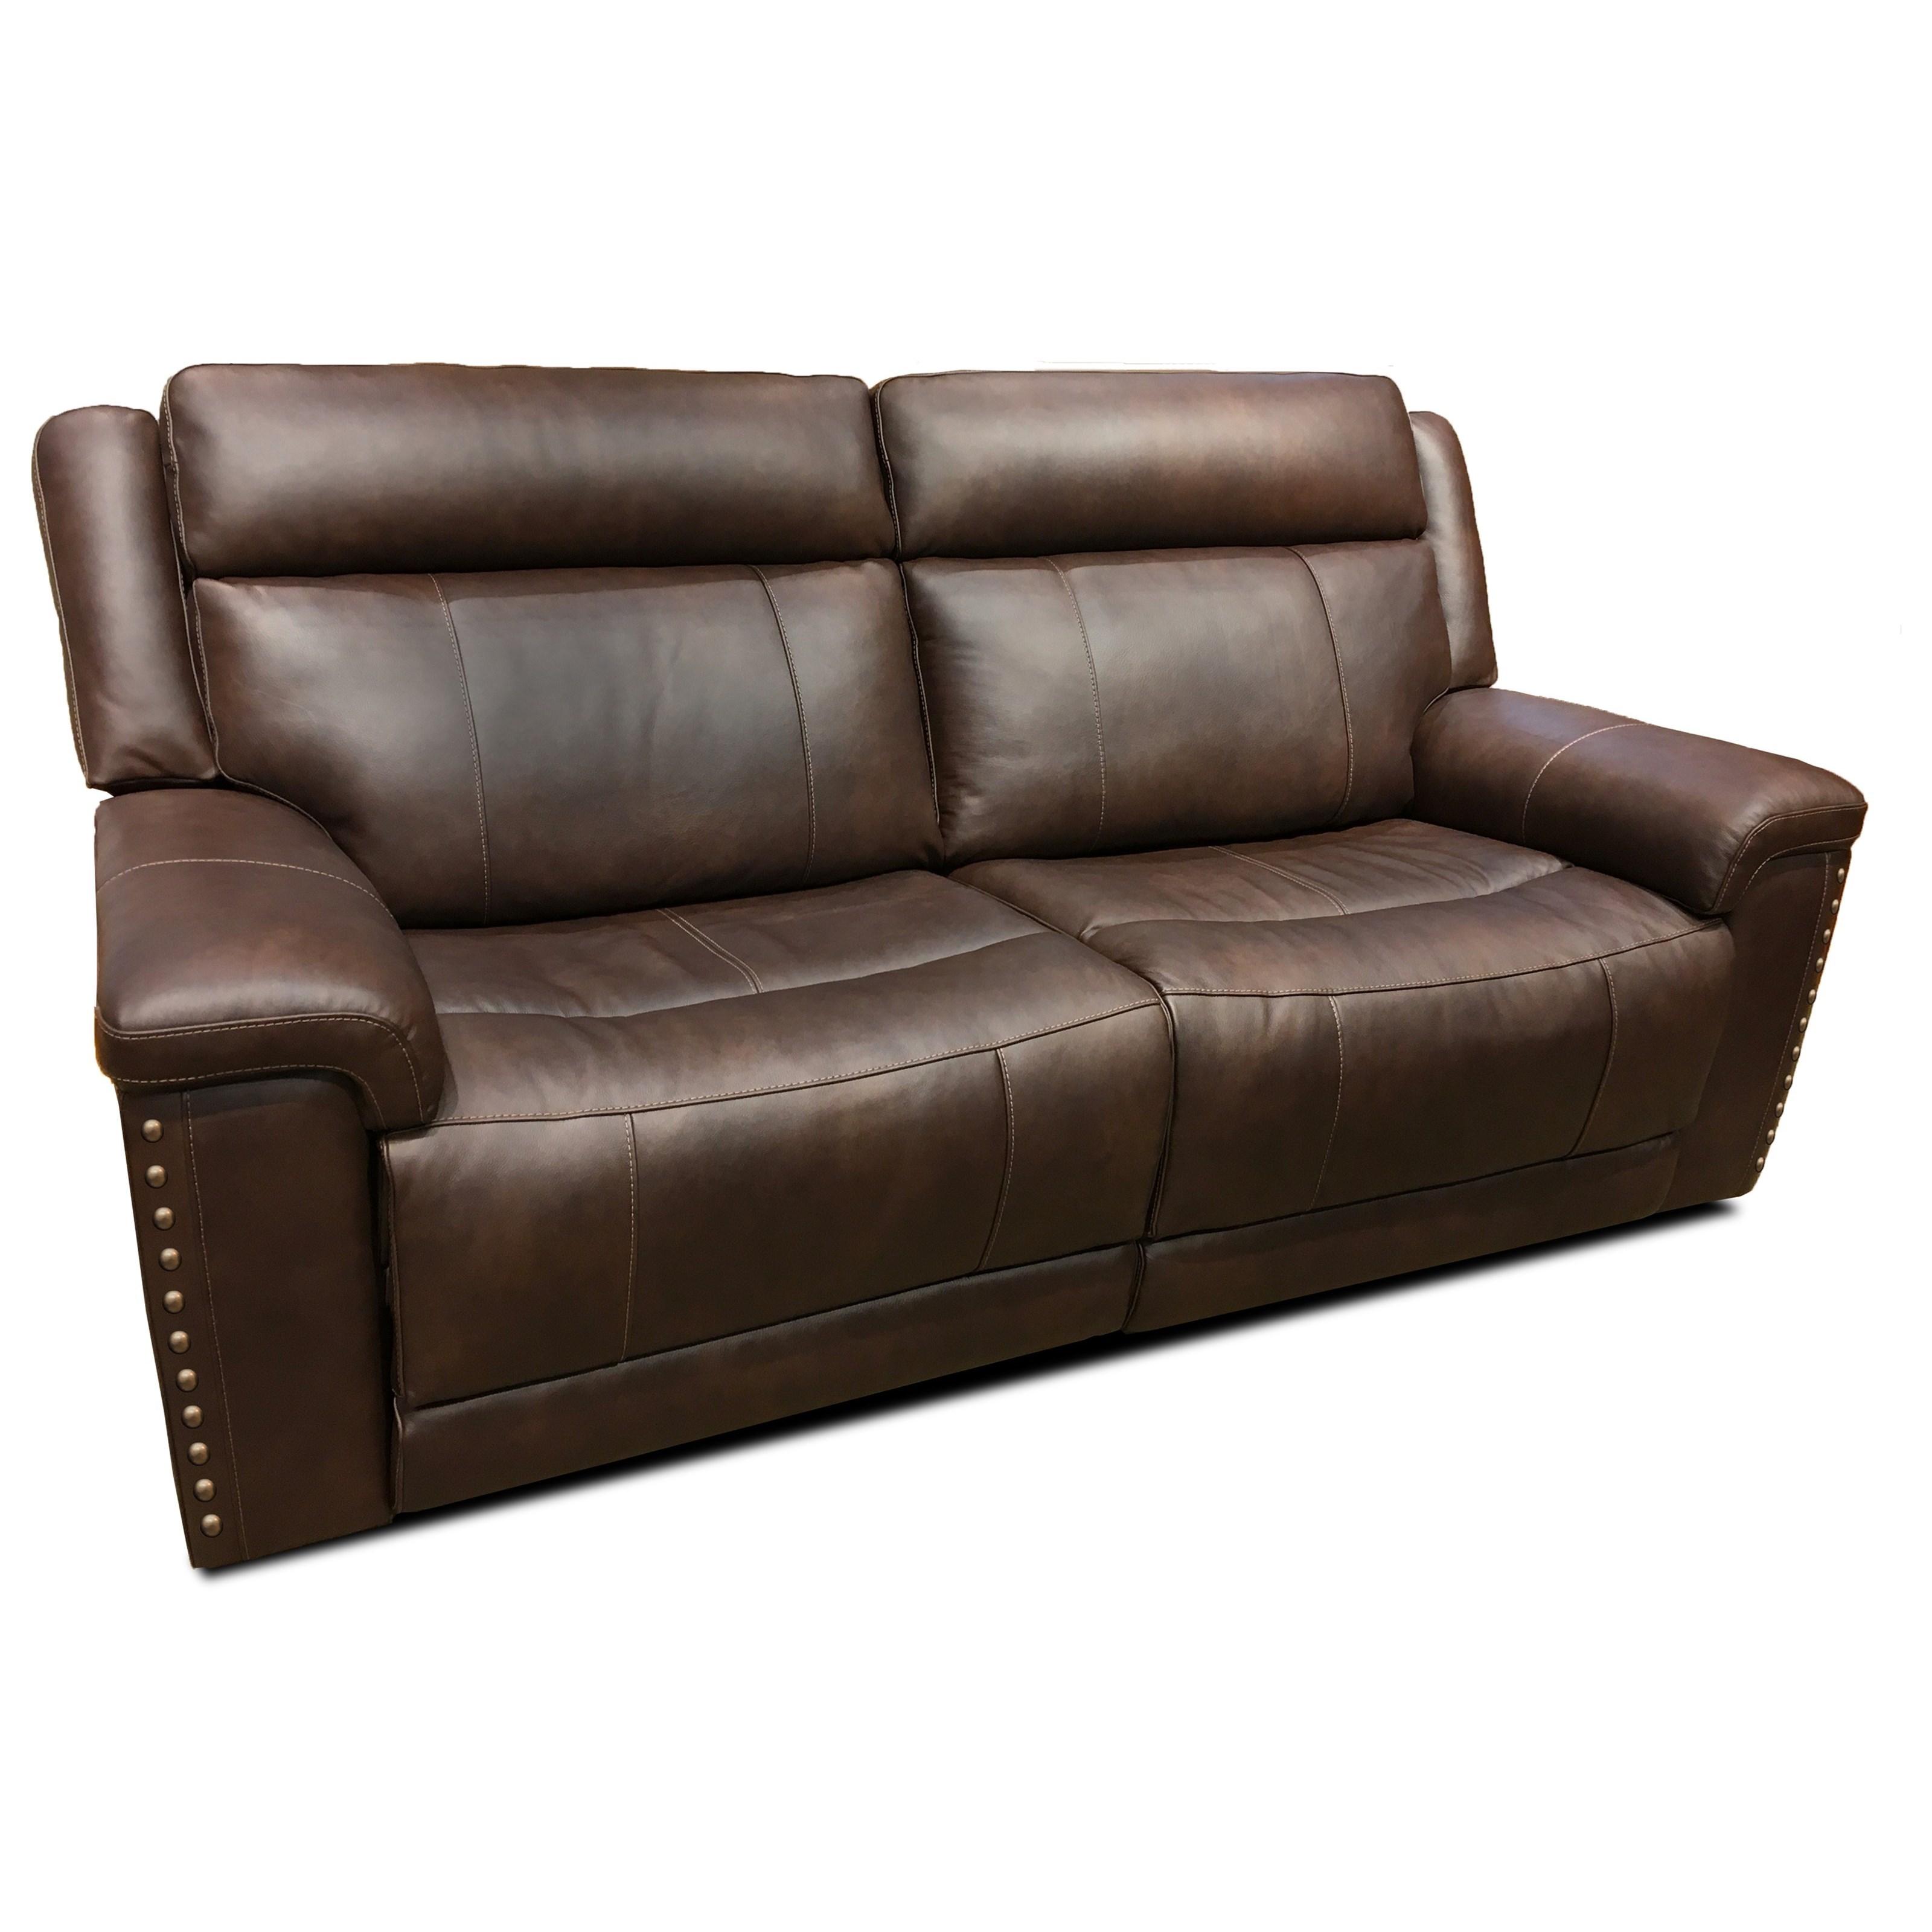 Latitudes - Yuma Pwr Rcl Sofa w/ Pwr Hdrst by Flexsteel at Walker's Furniture